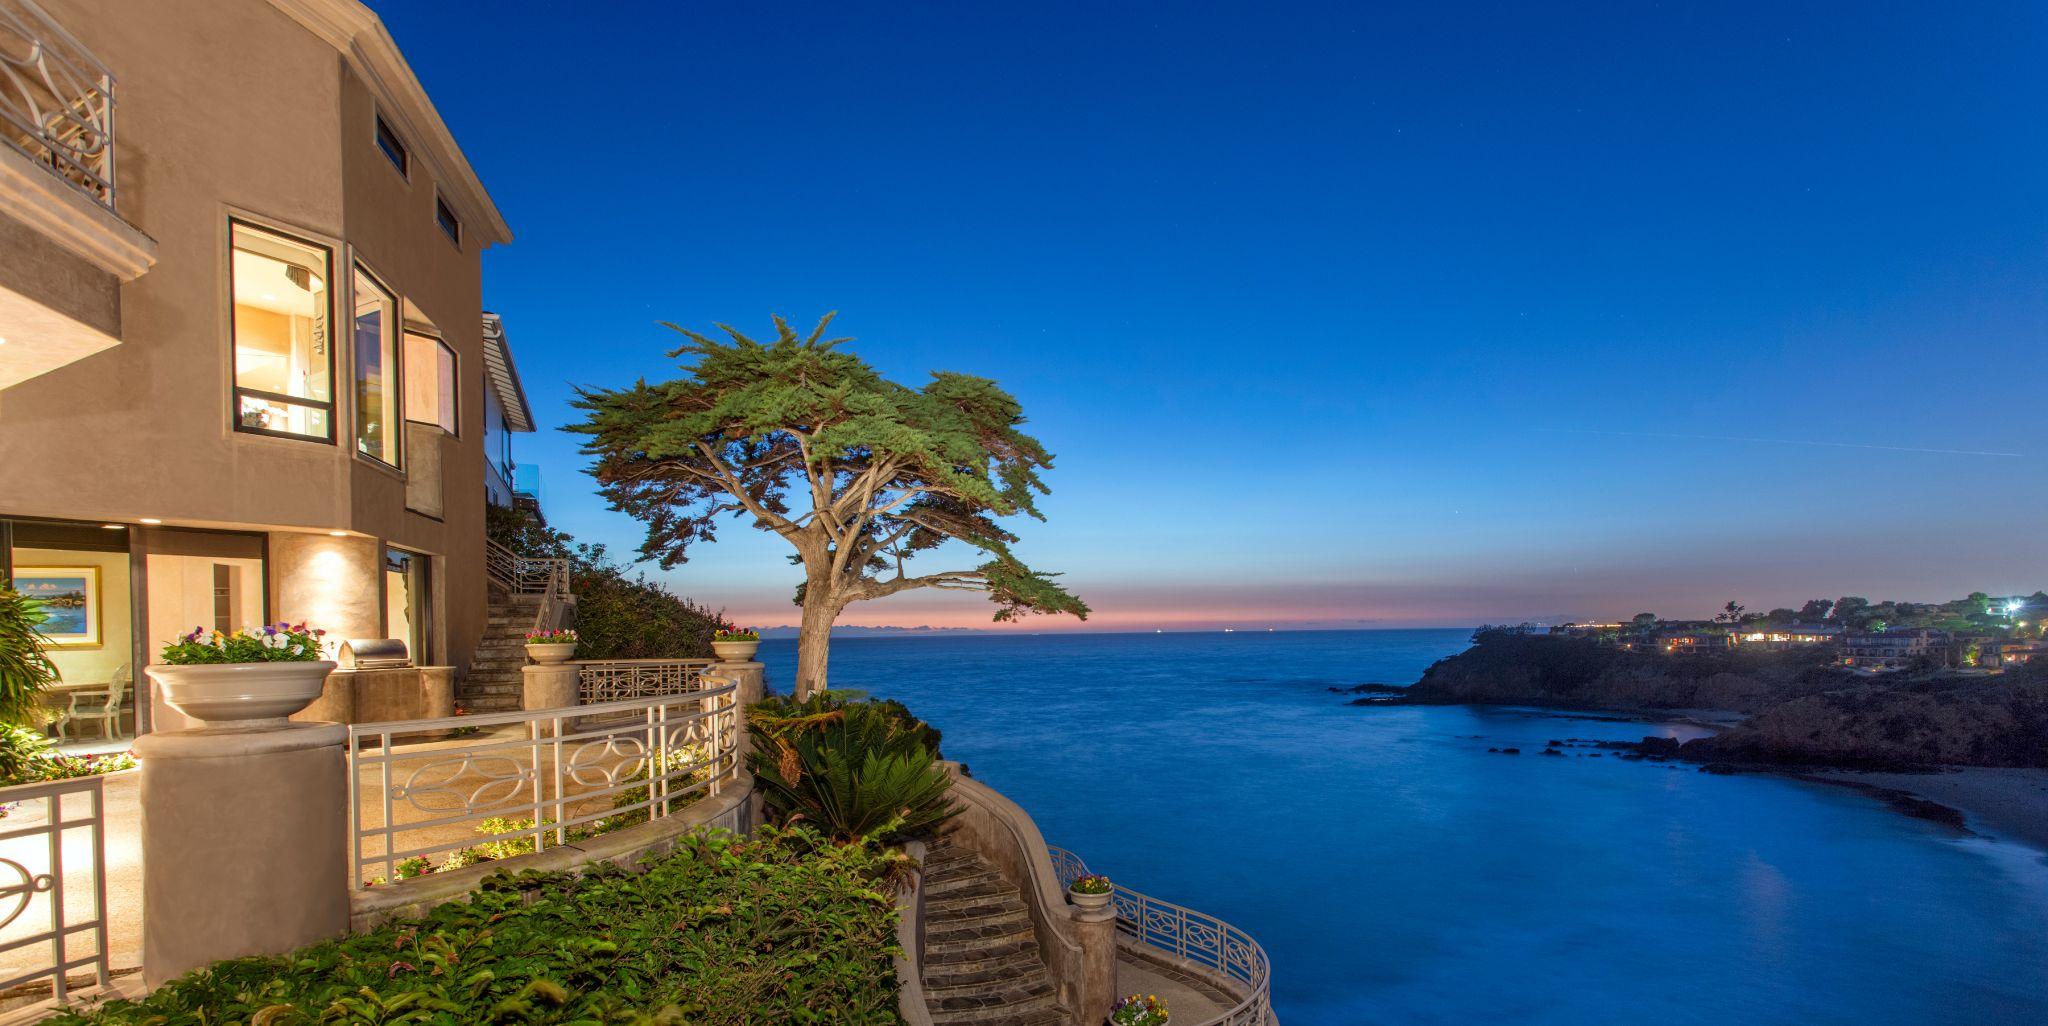 Stunning California Beach House Inspired By The Horizon: 10 Beautiful Views From Homes